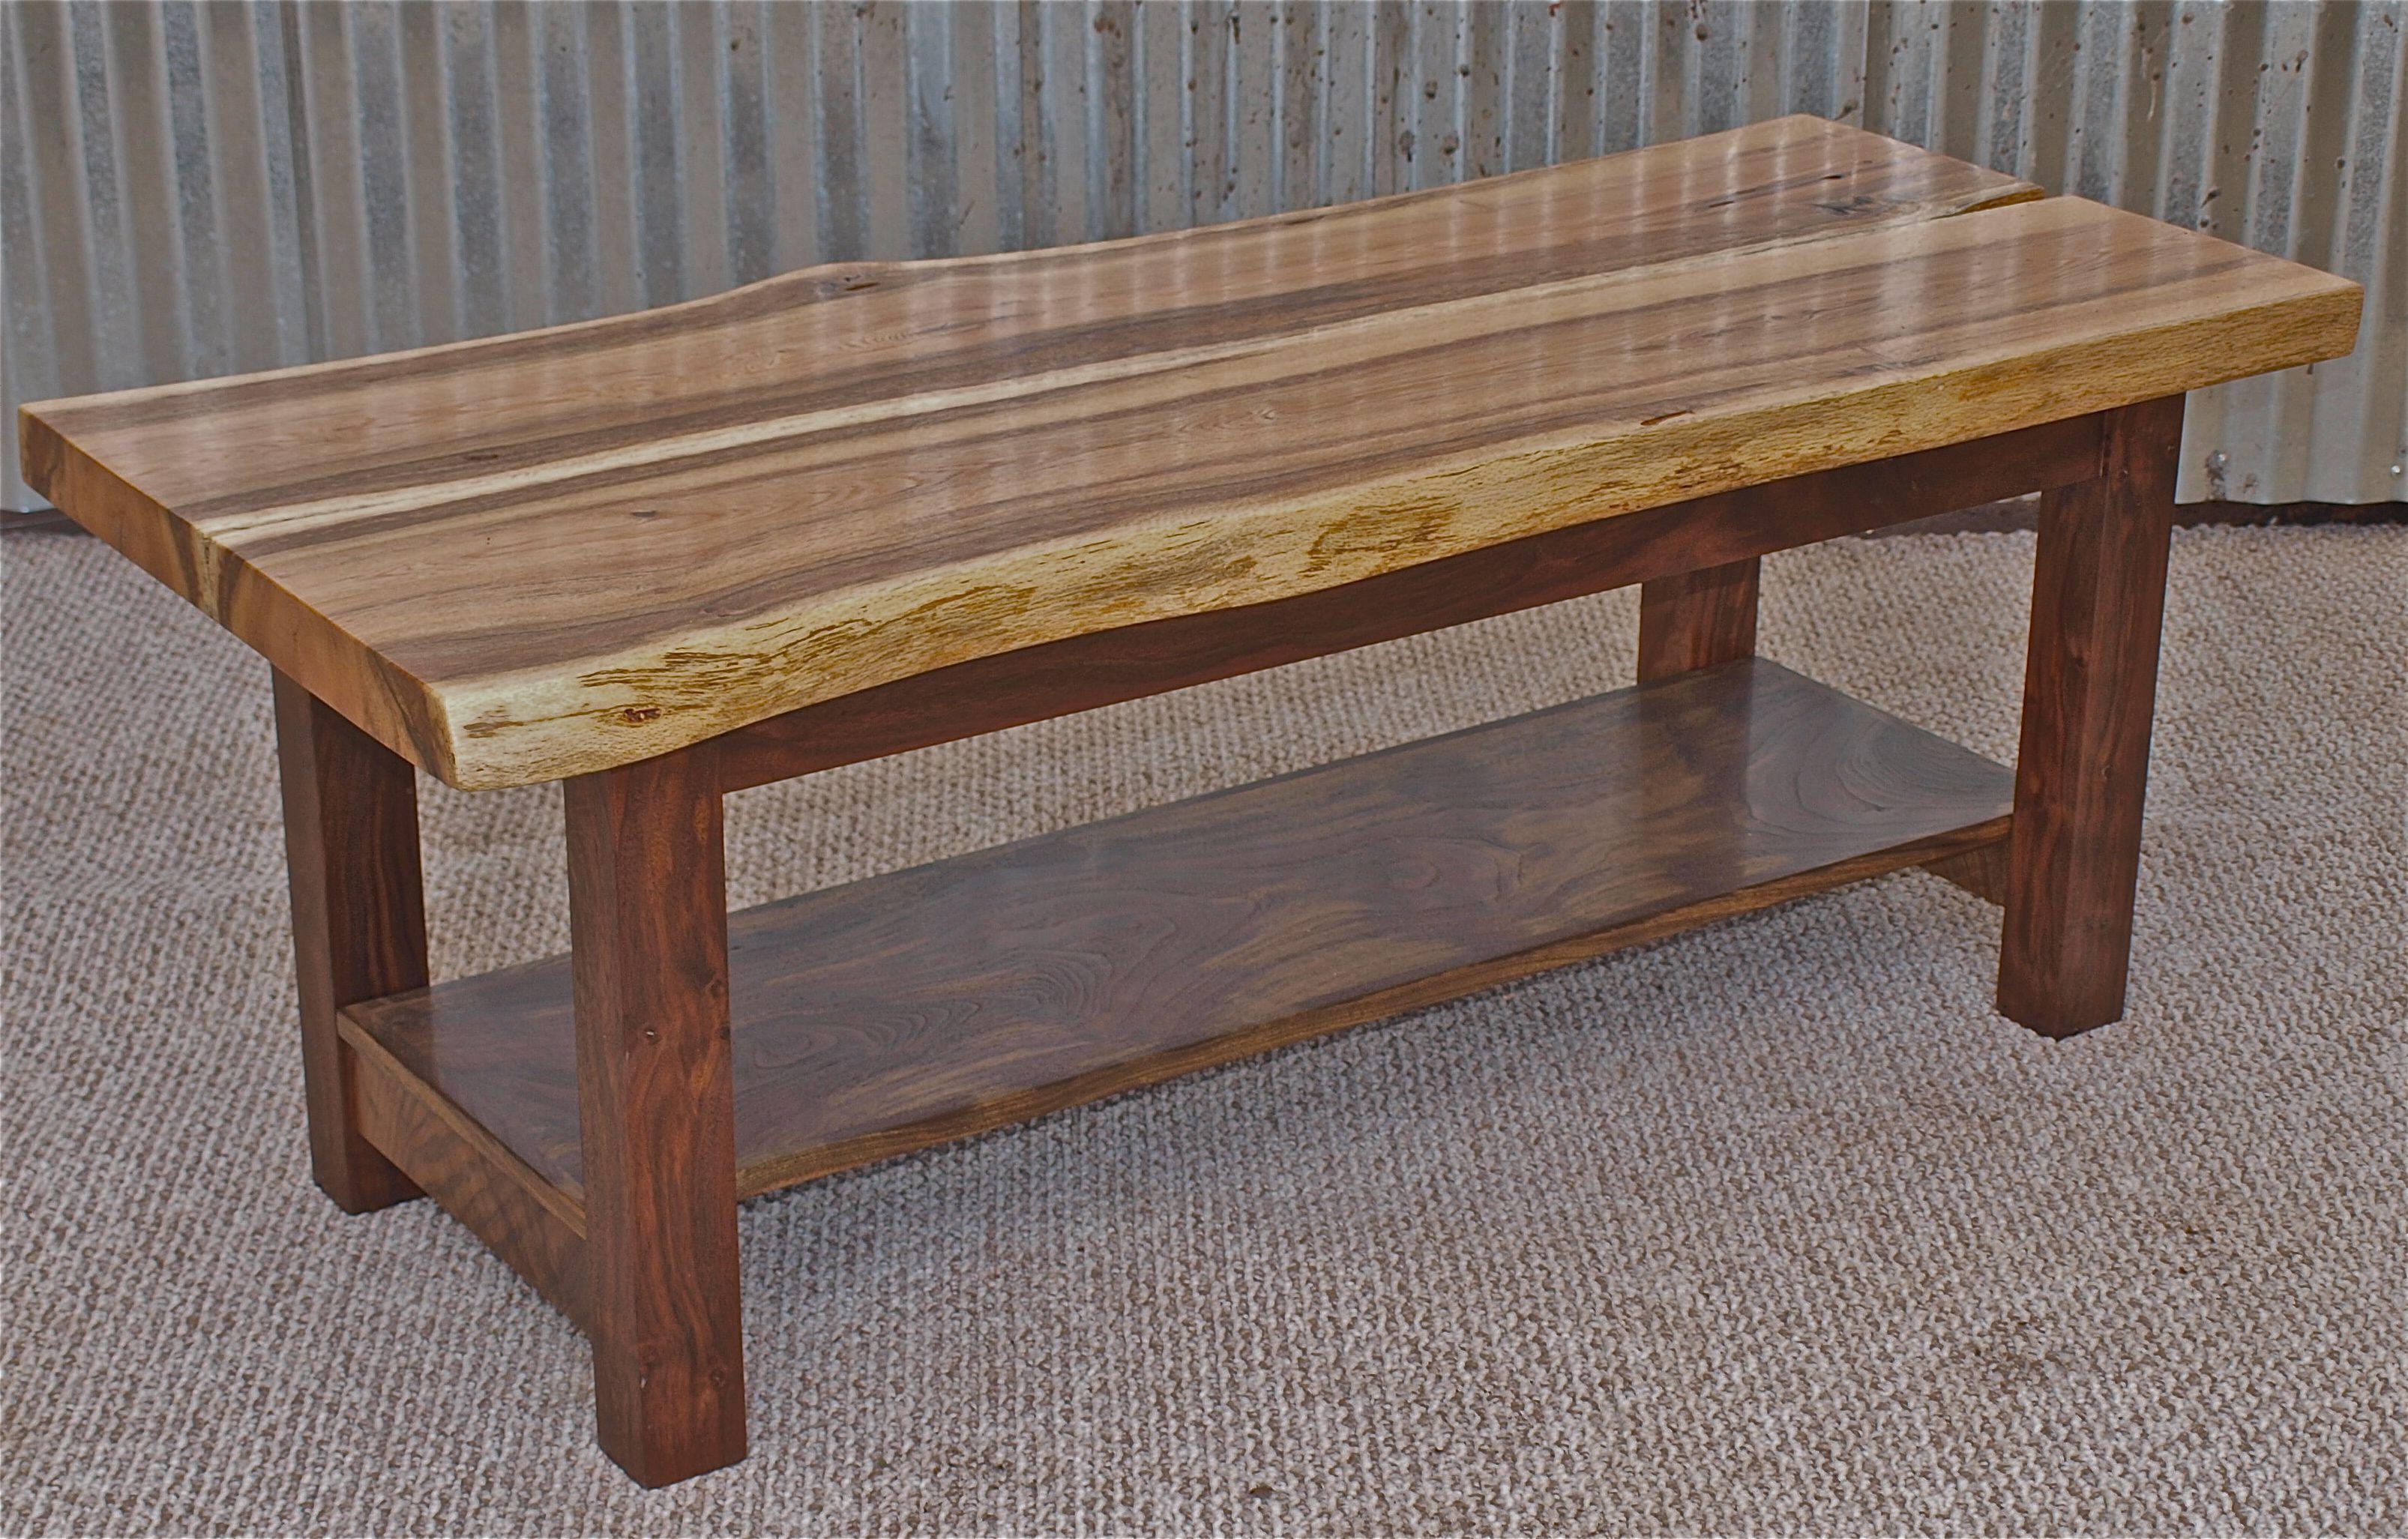 Black Walnut Coffee Table Live Edge Oak Coffee Table With Black Walnut Base Shelf 48 X 20